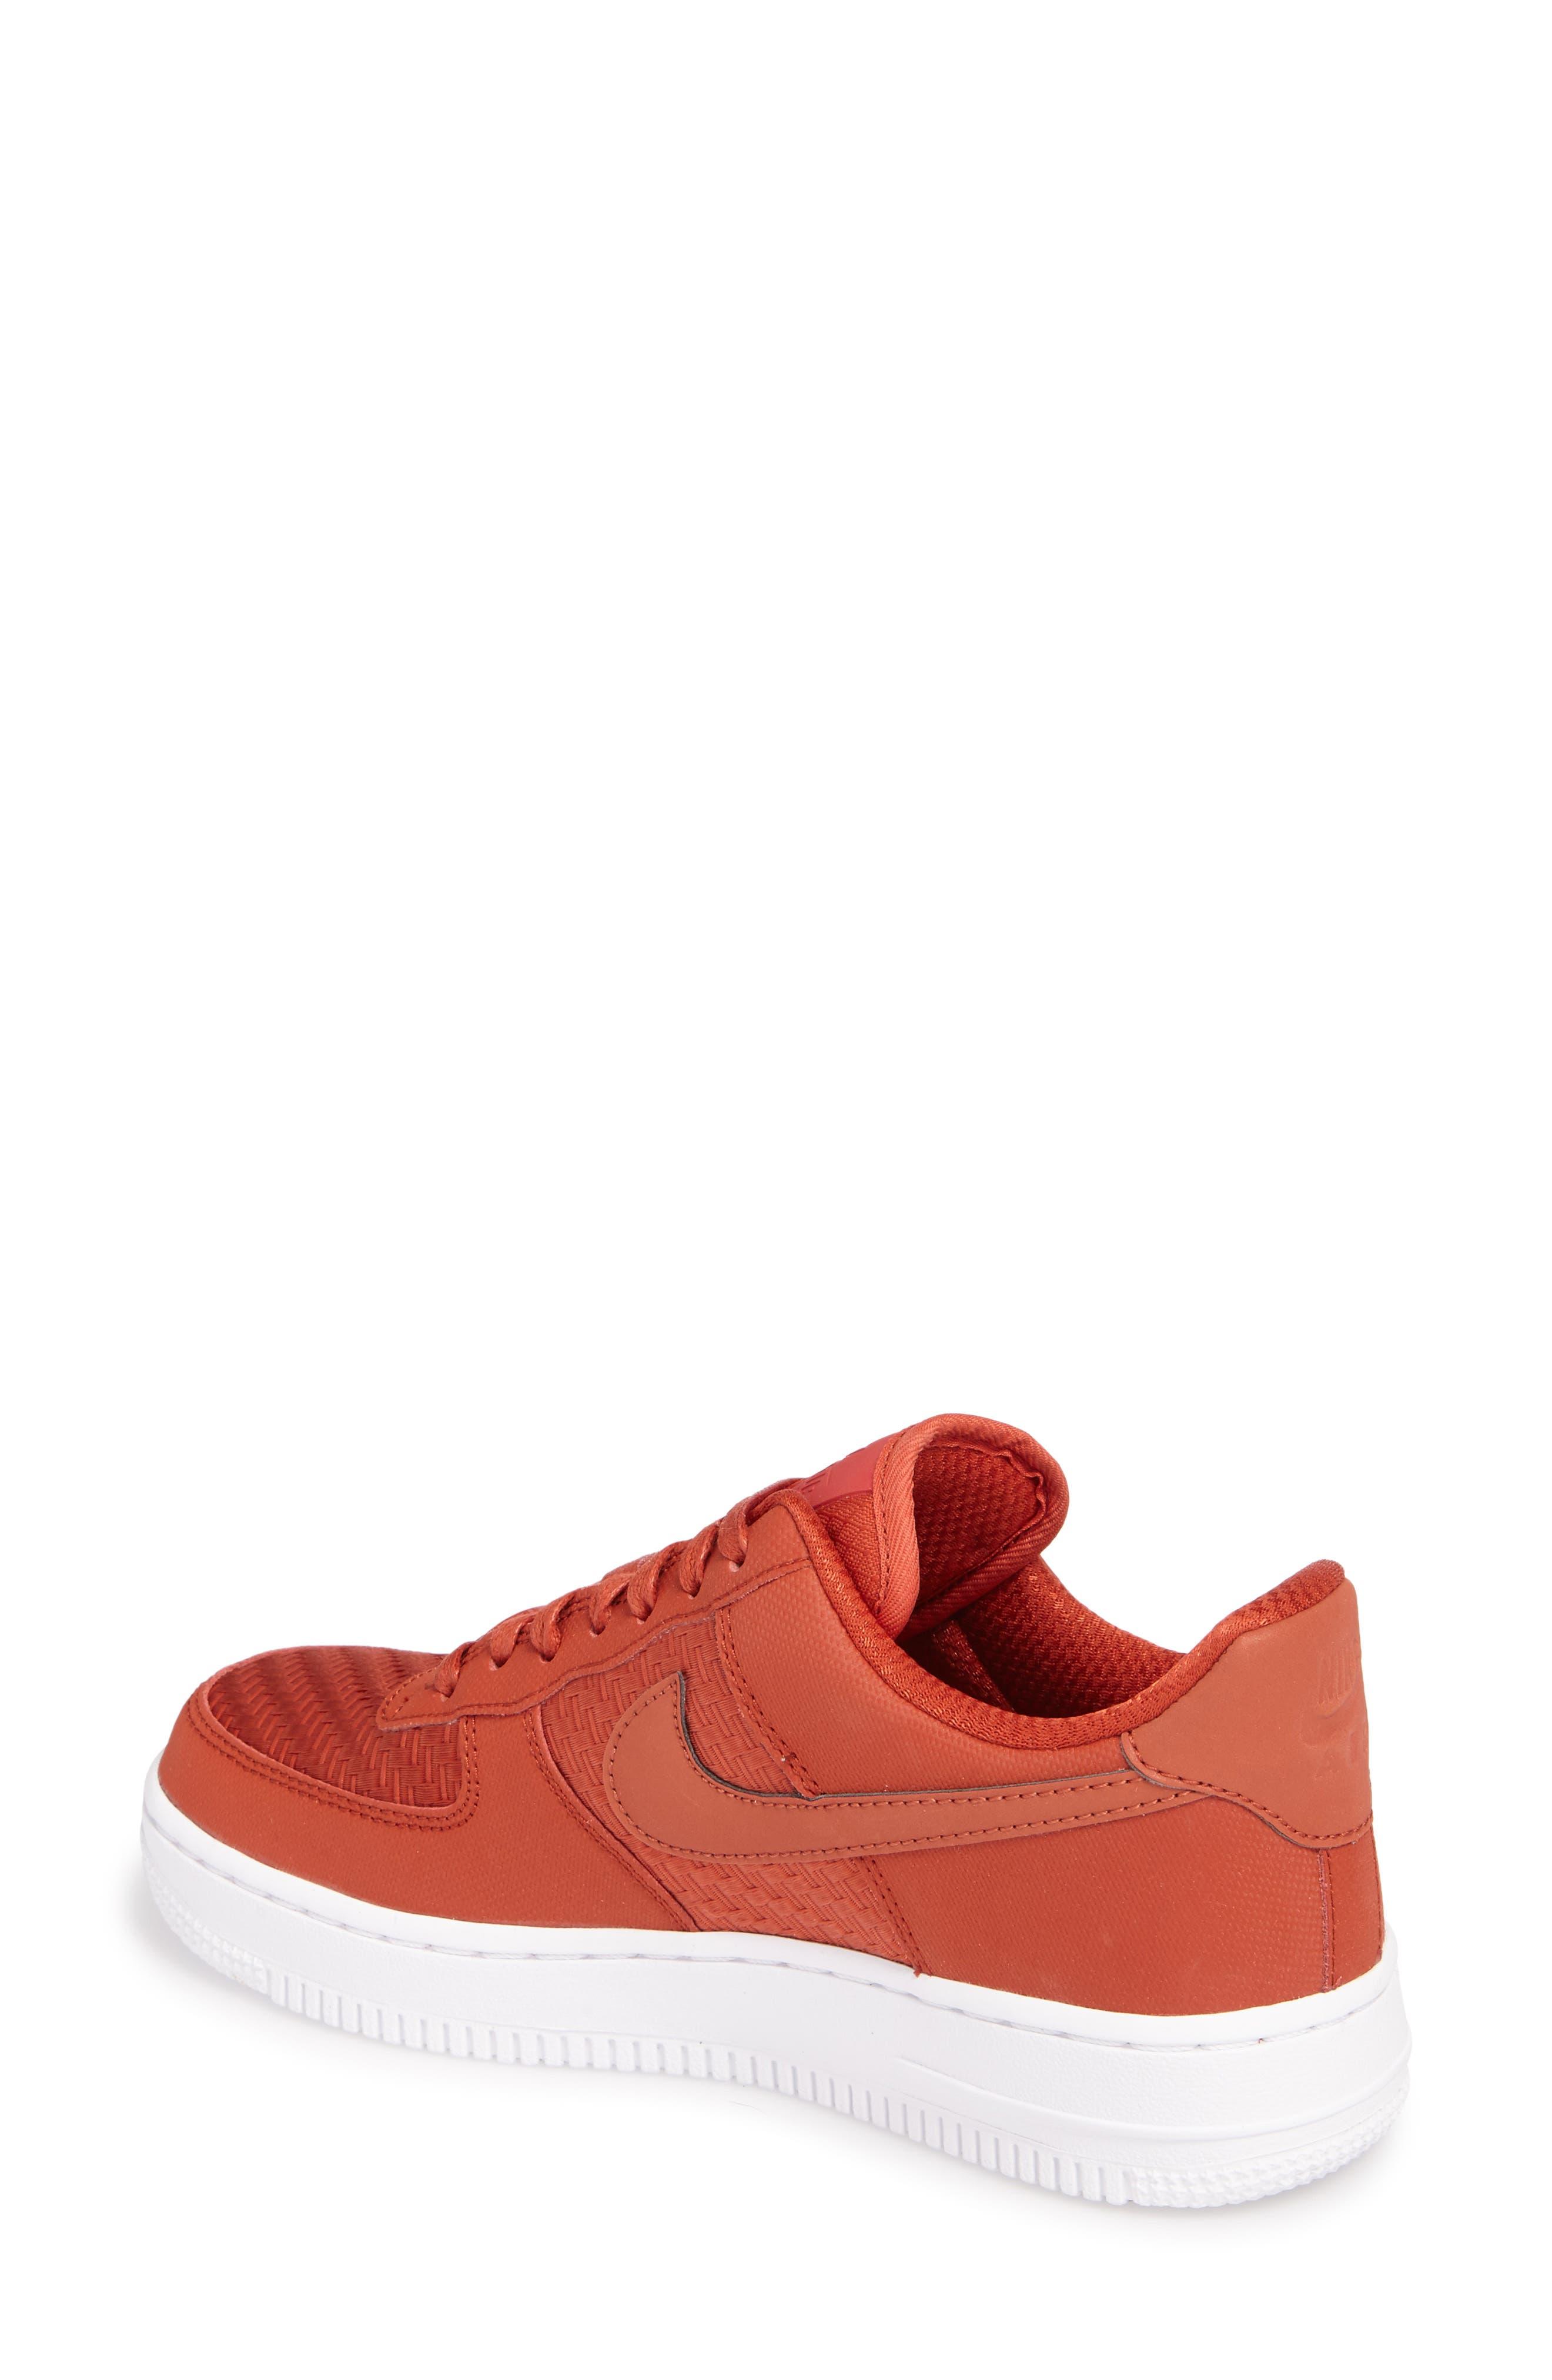 Air Force 1 '07 Pinnacle Sneaker,                             Alternate thumbnail 2, color,                             DRAGON